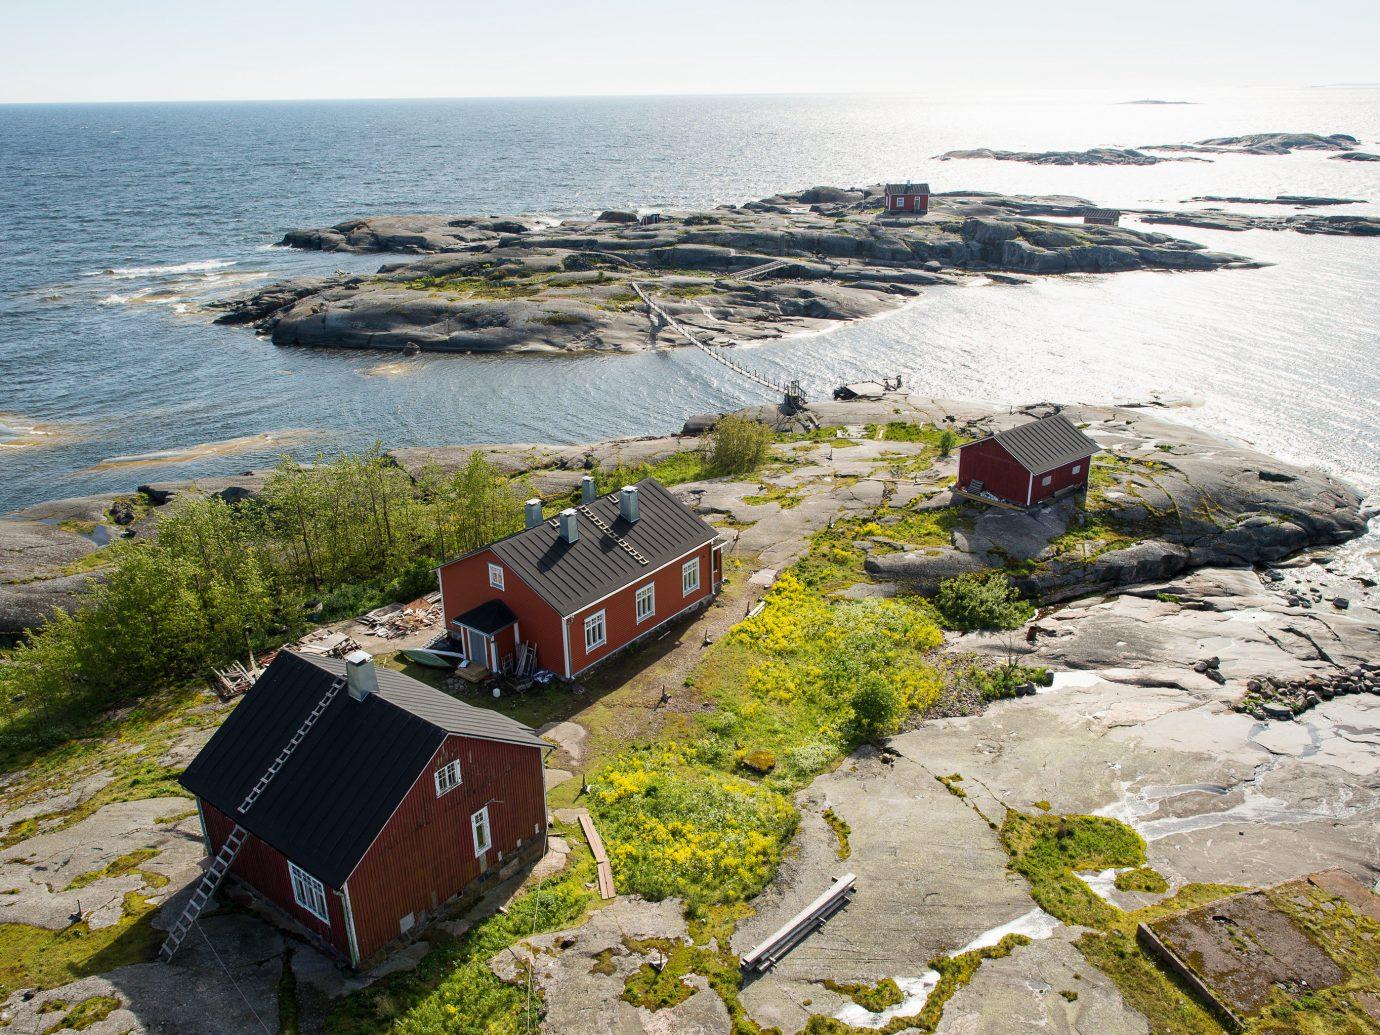 Trip Ideas outdoor sky Coast landform shore Sea aerial photography cliff rock Ocean vehicle terrain bay cape cove waterway promontory